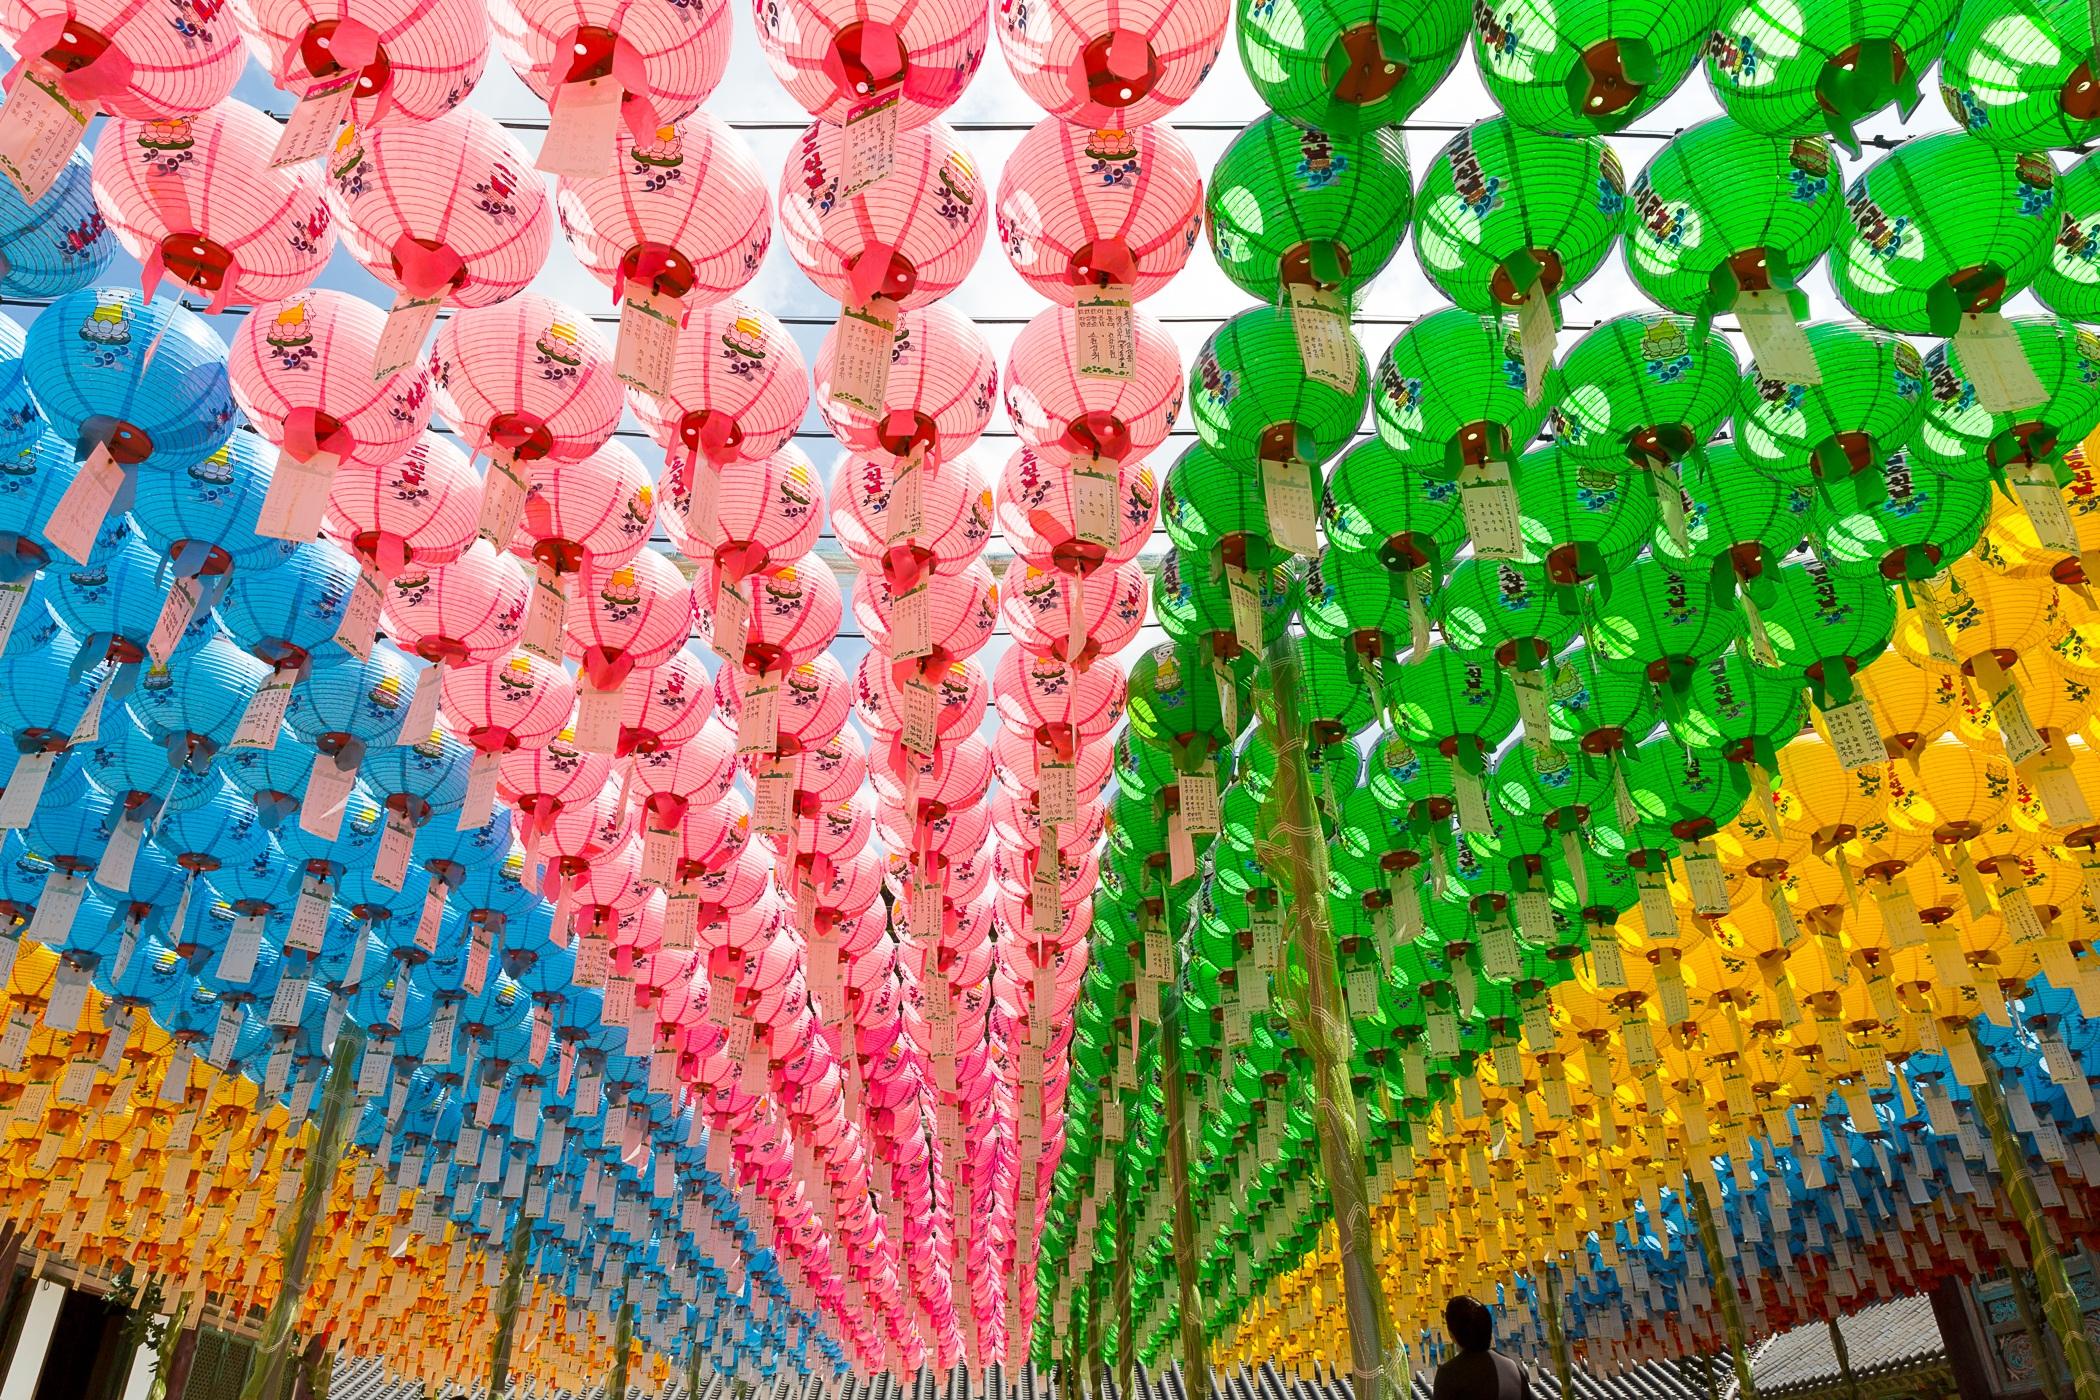 Fotos gratis : flor, viajar, patrón, juguete, textil, art, Daegu ...